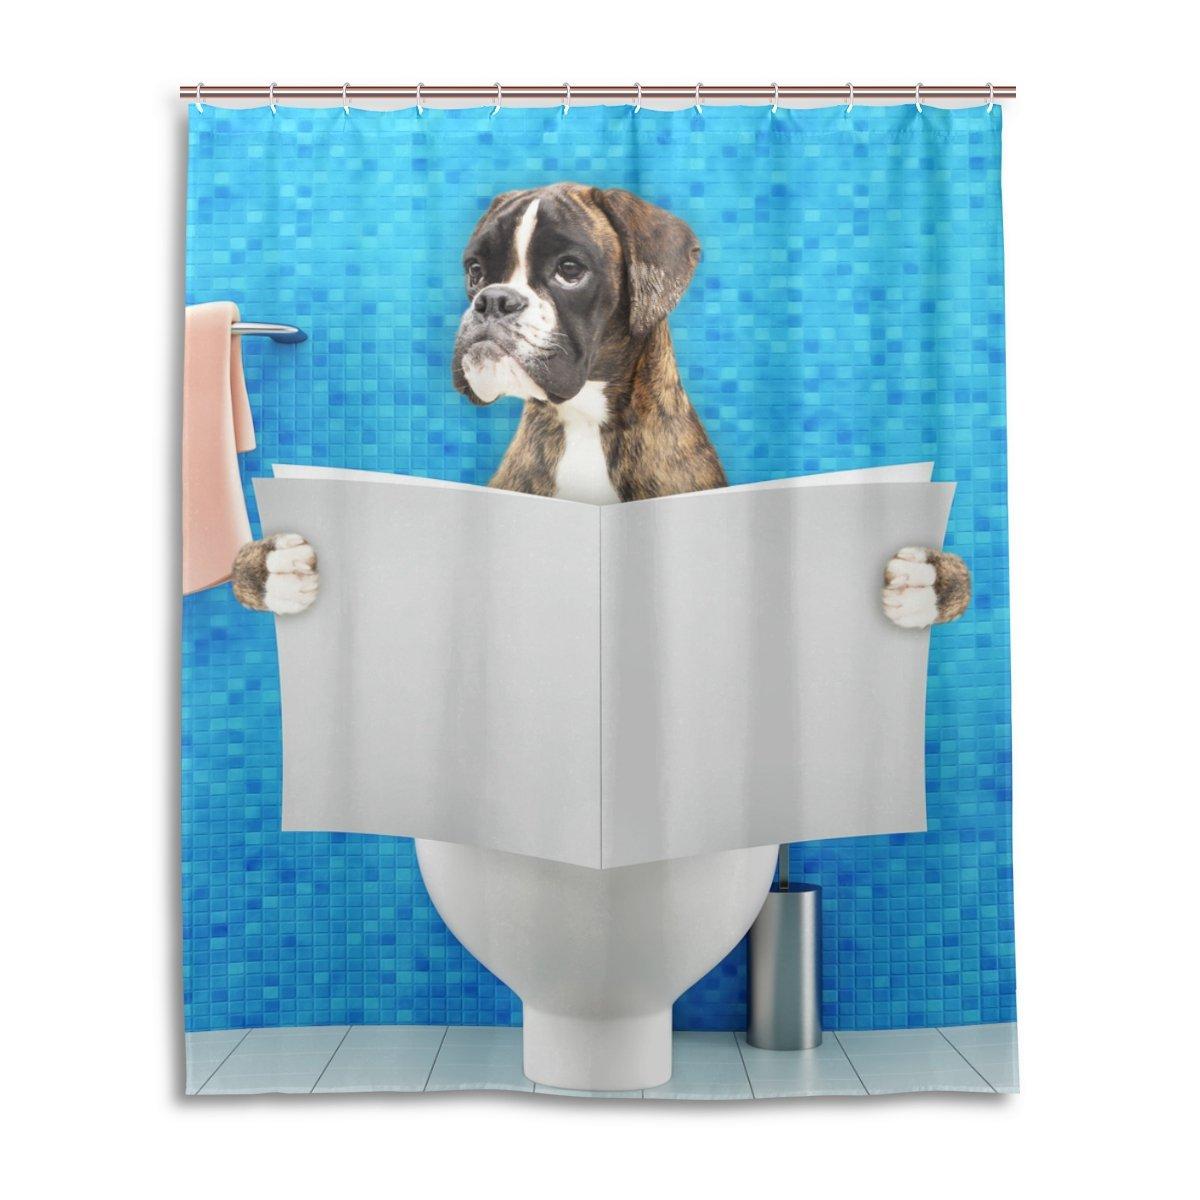 Chen Miranda Waterproof Shower Curtain Everday Use Boxer Dog Bathroom Set Polyester Fabric Hooks